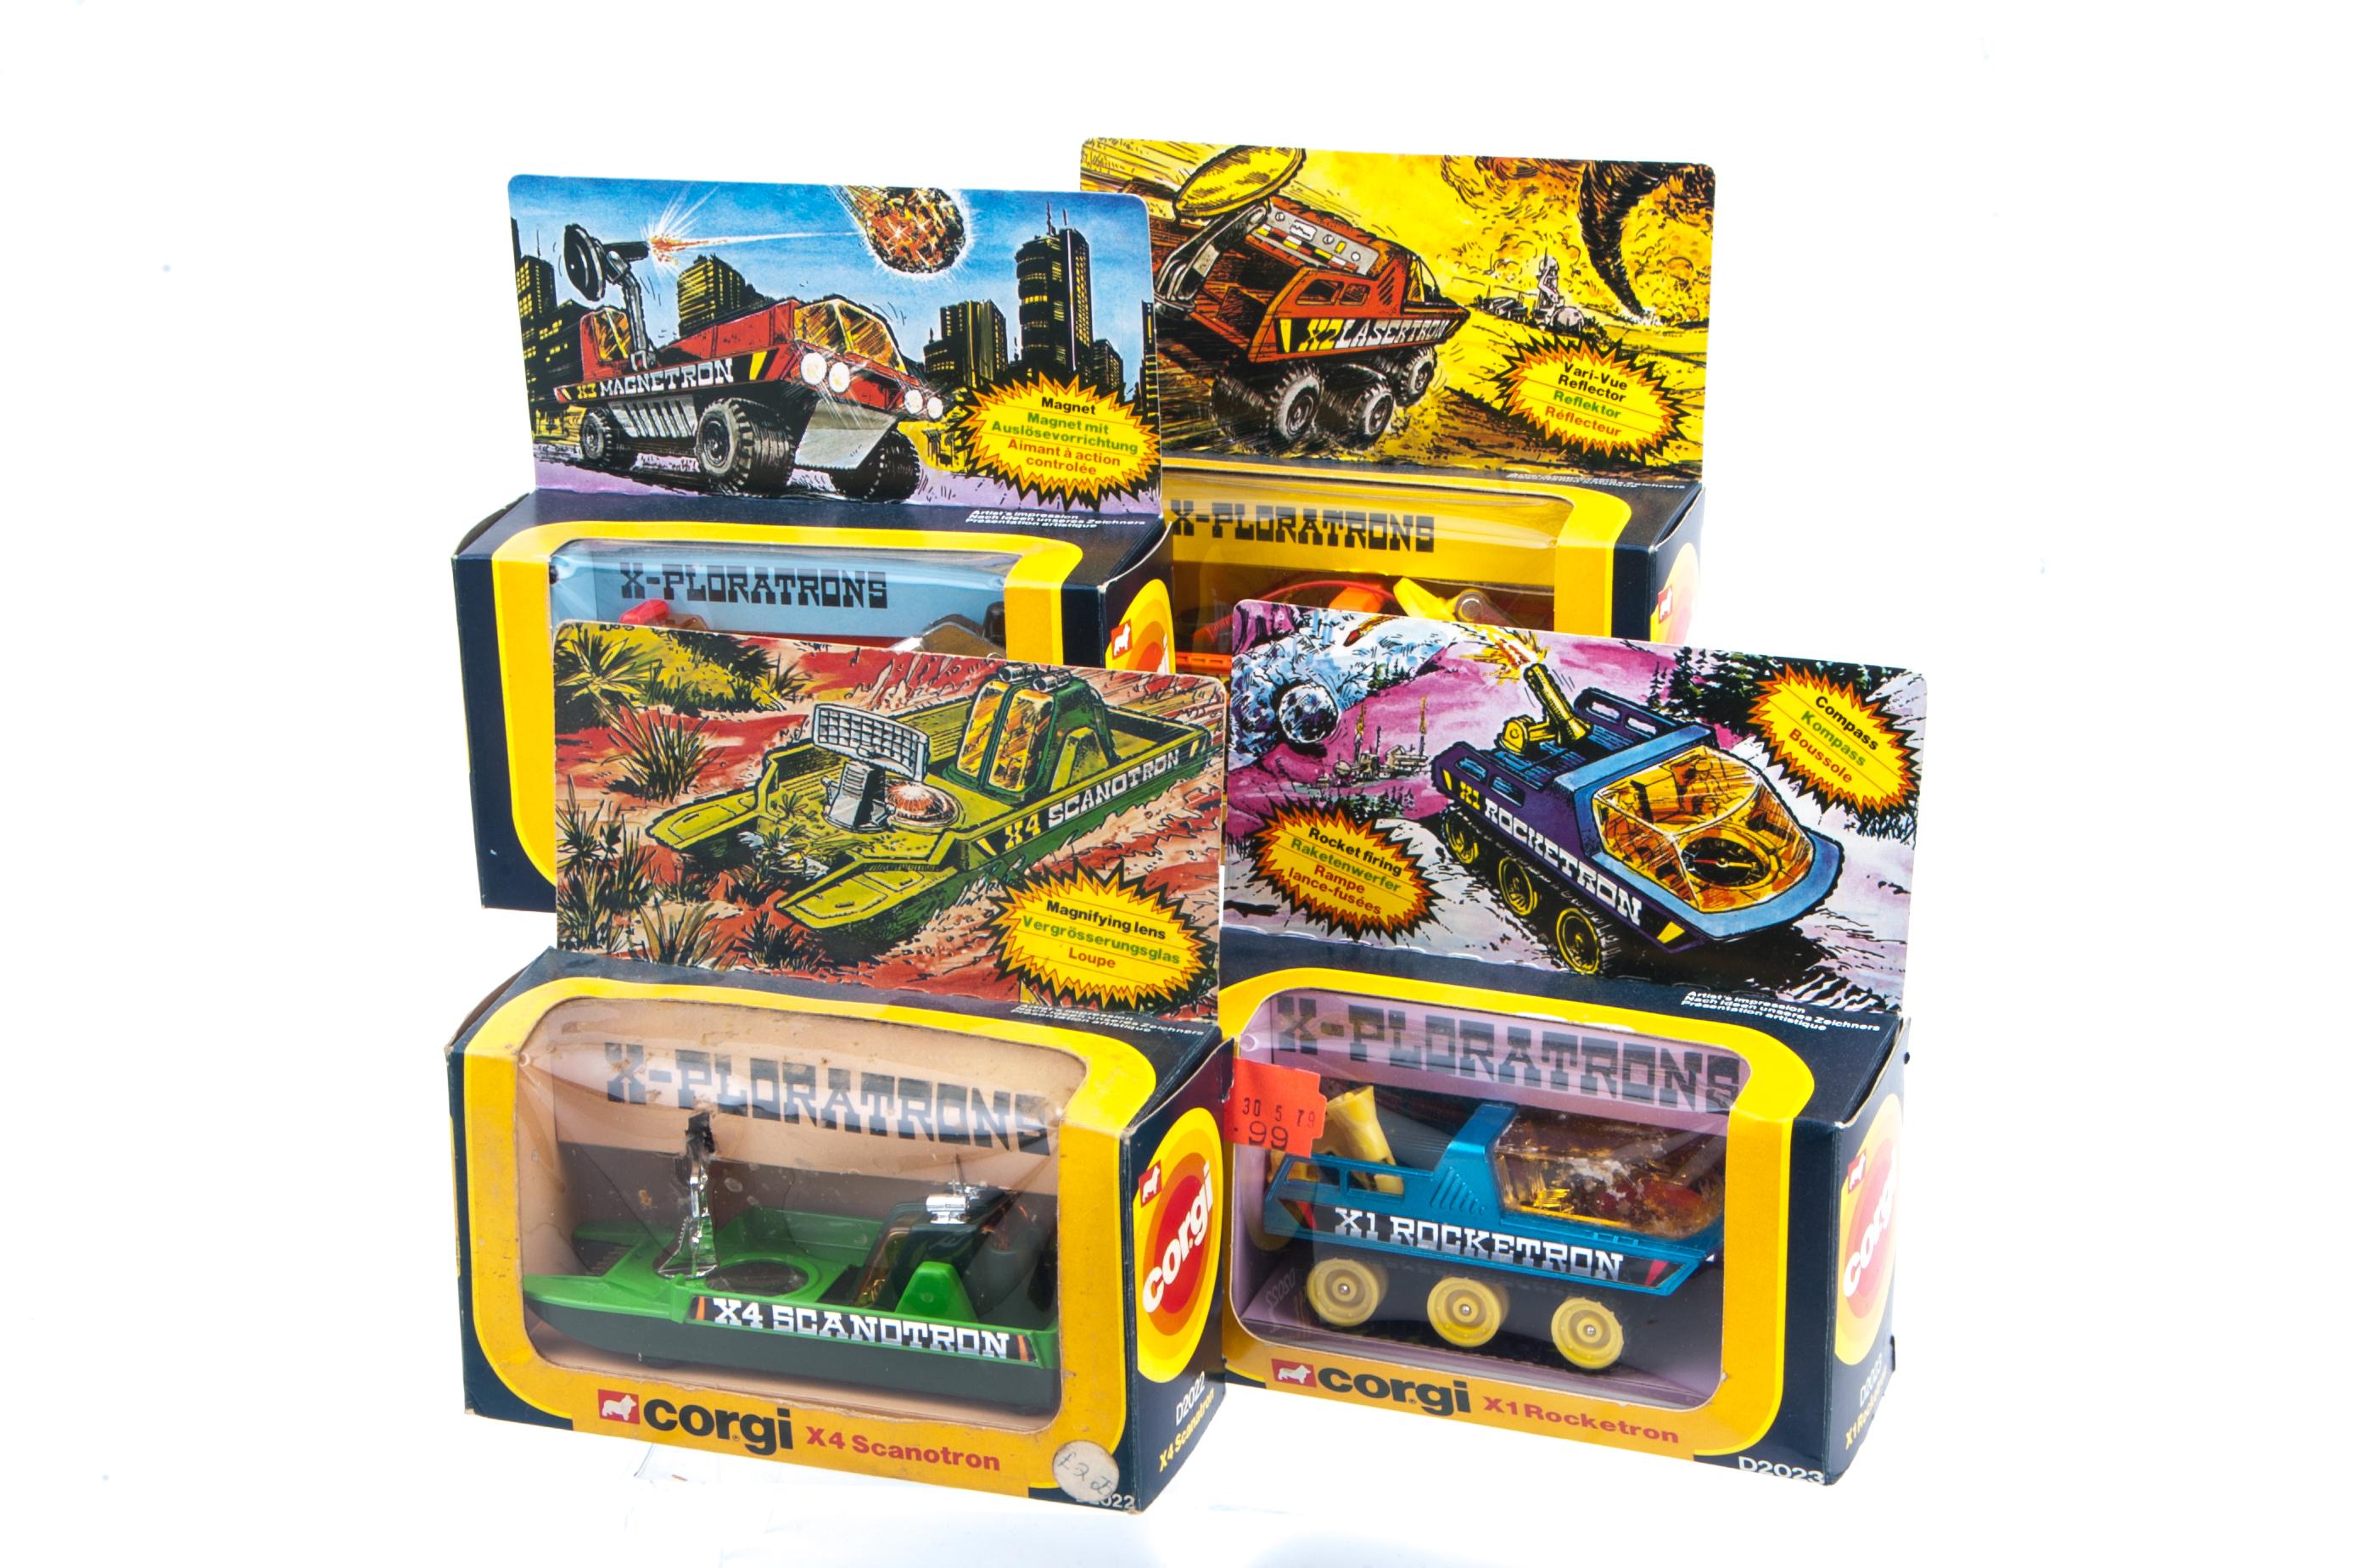 Corgi Toys 1979 X-Ploratrons, D2022 X-4 Scanotron (2), D2023 X1 Rocketron, D2024 X2 Lasertron and X3